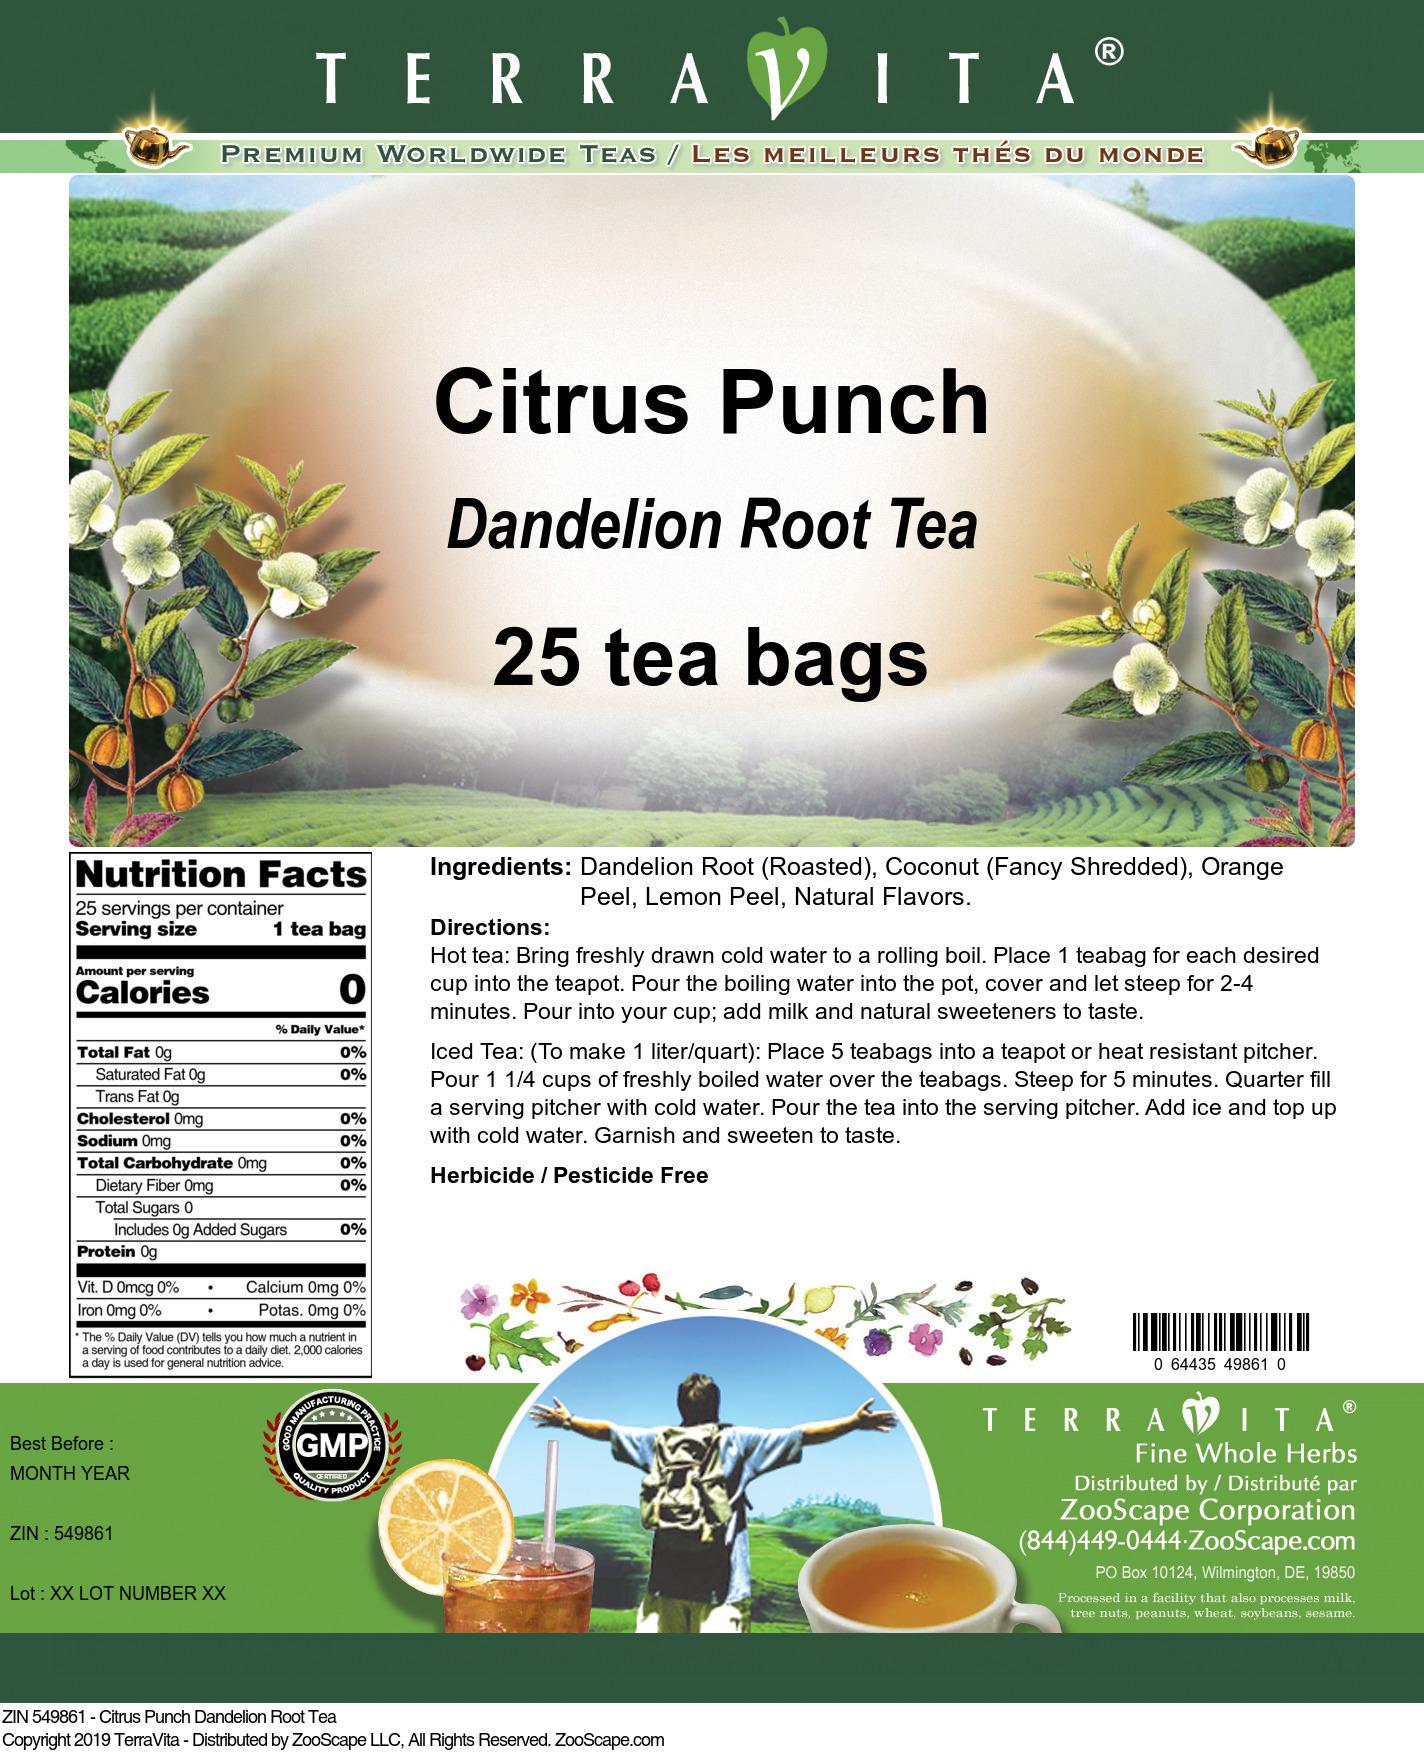 Citrus Punch Dandelion Root Tea